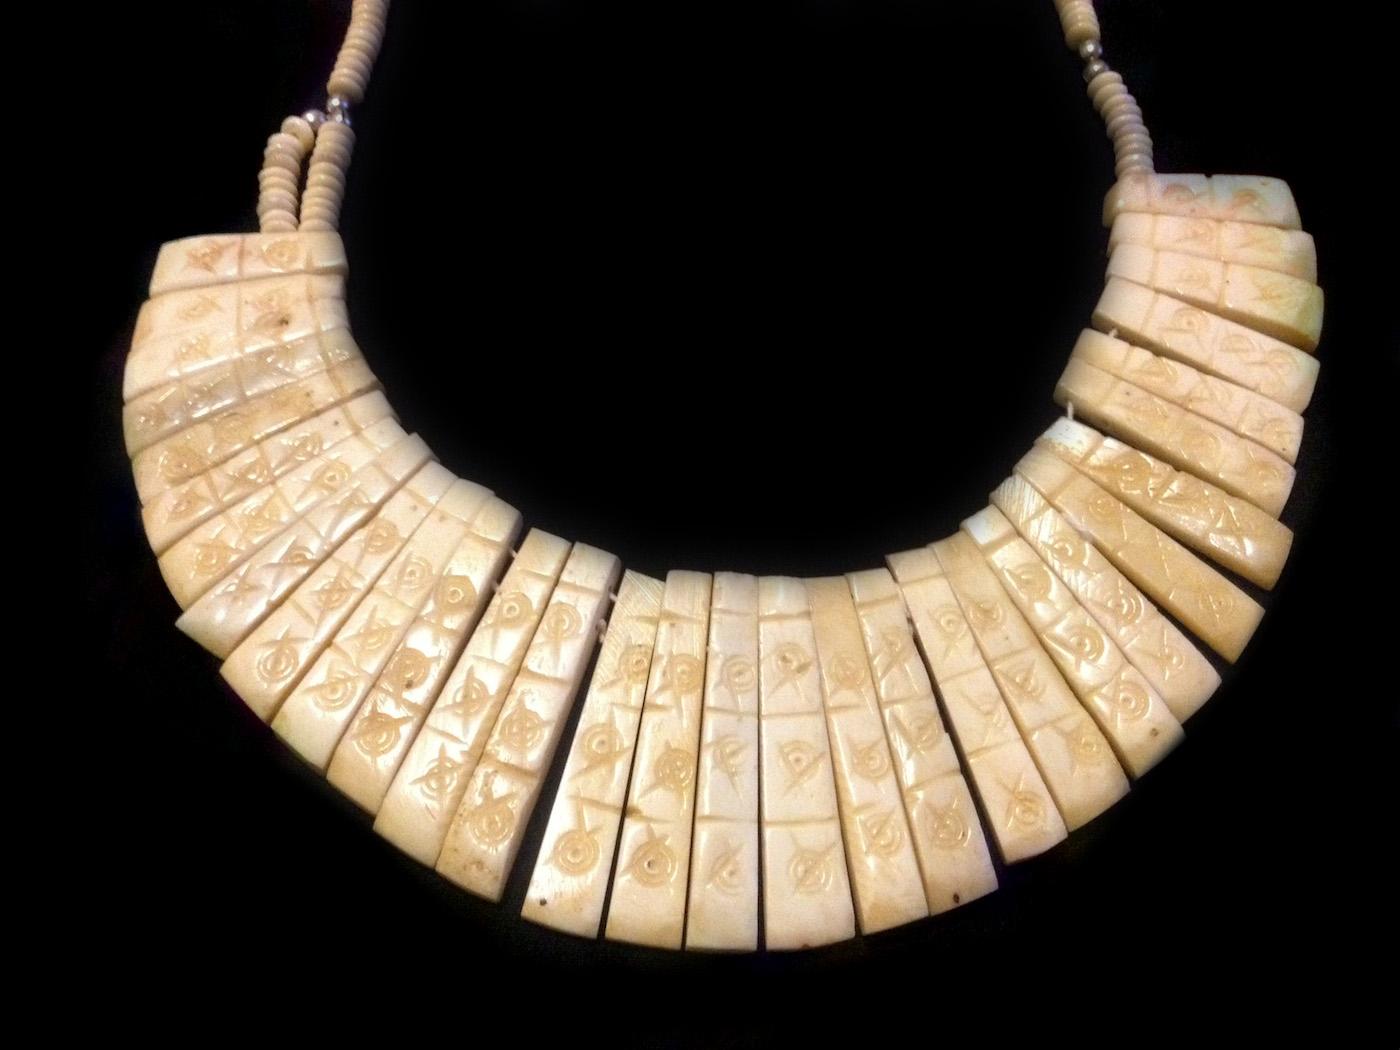 claudia seone jewelry necklace twilight